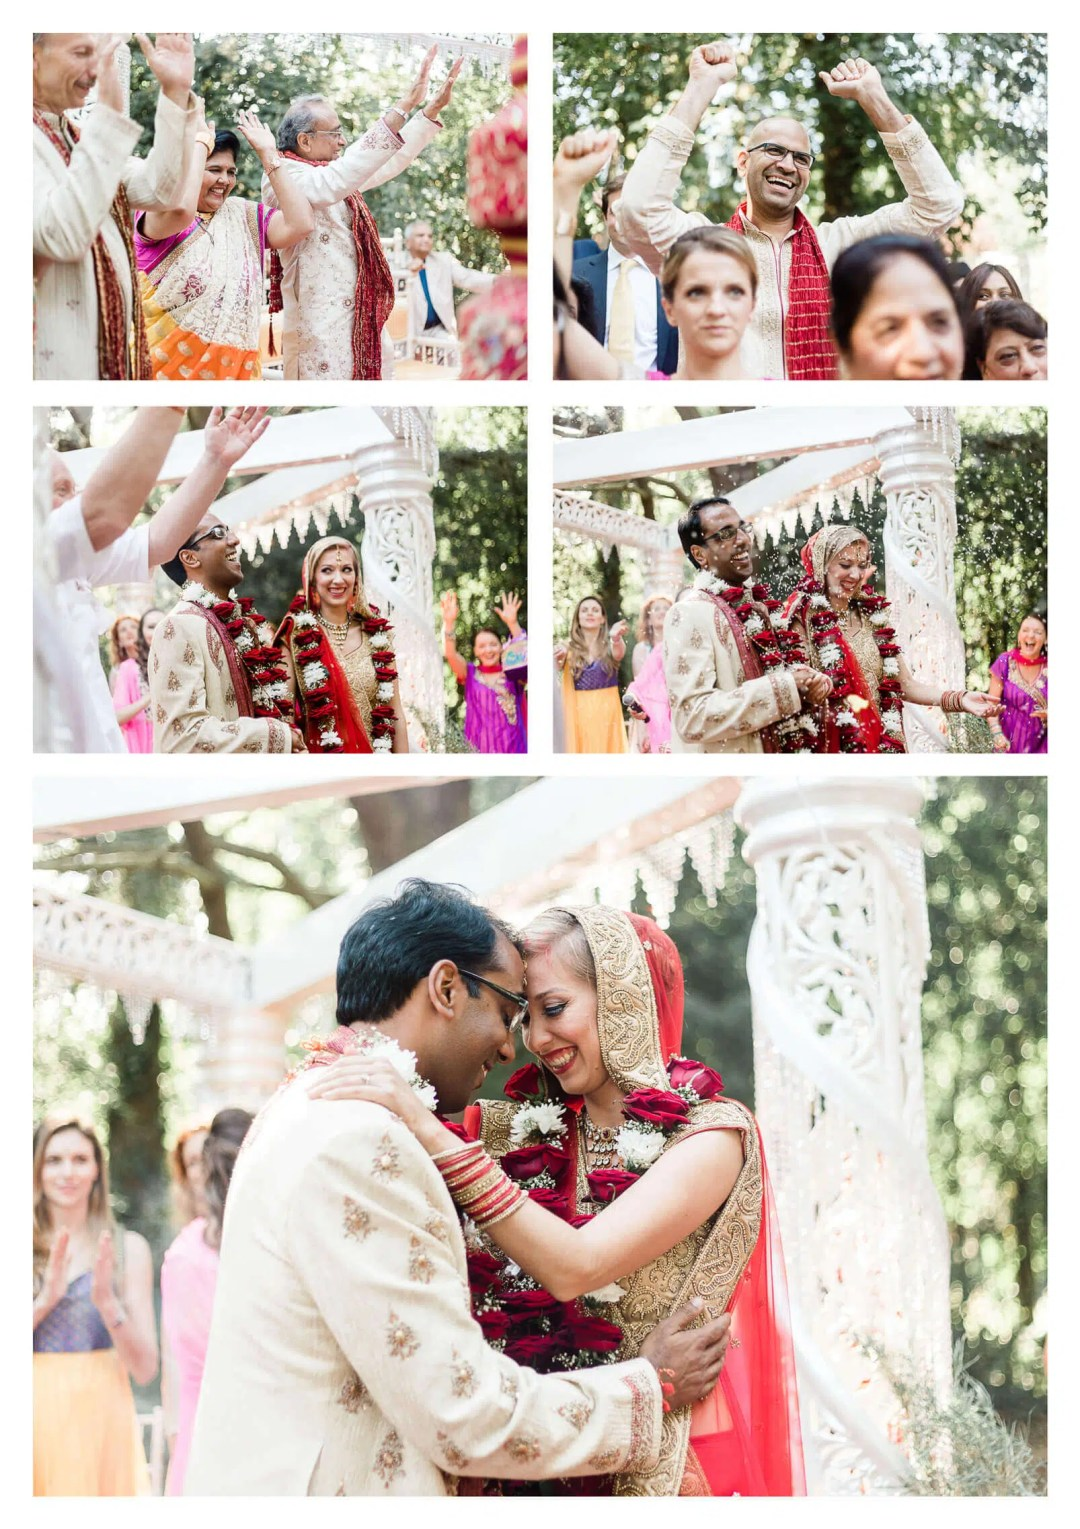 Baddow Park Hindu multicultural wedding ceremony | Essex photographer